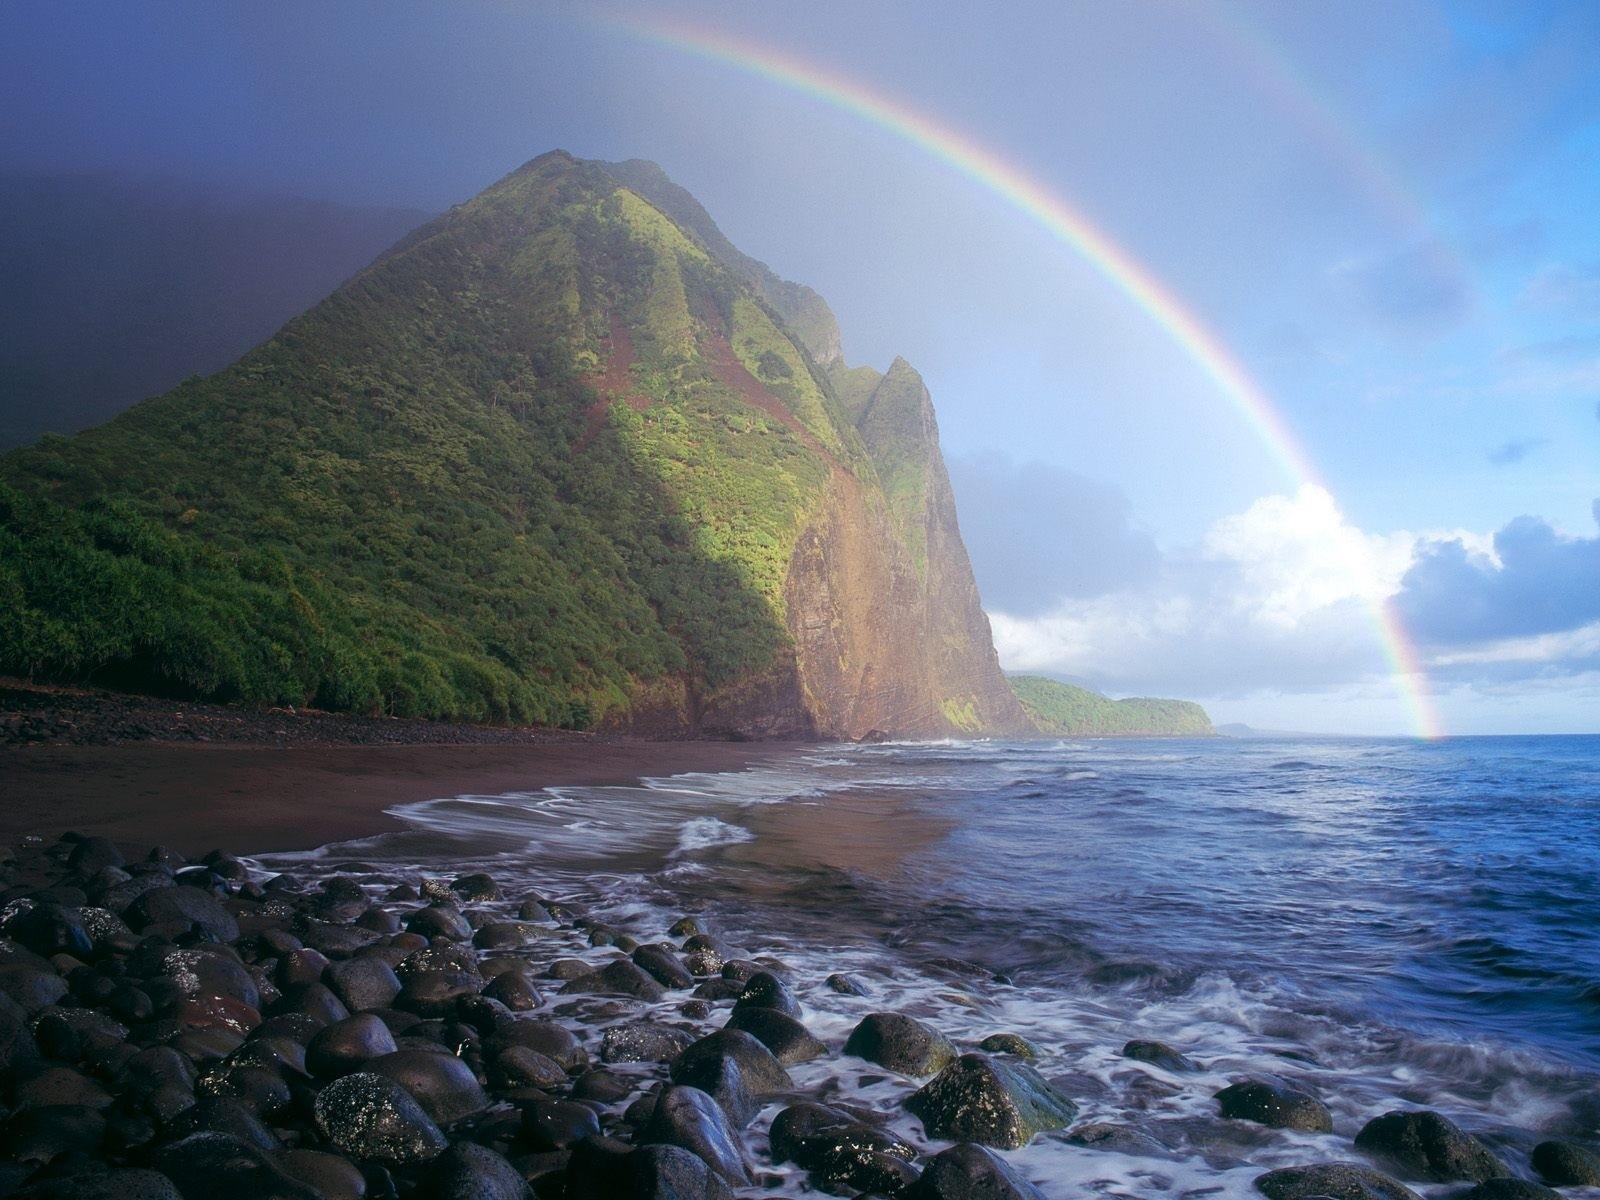 http://4.bp.blogspot.com/-6Fow-cymtMI/TiMiOxr7taI/AAAAAAAACM8/gOg8KO2bcvM/s1600/rainbow_hd_wallpaper.jpg